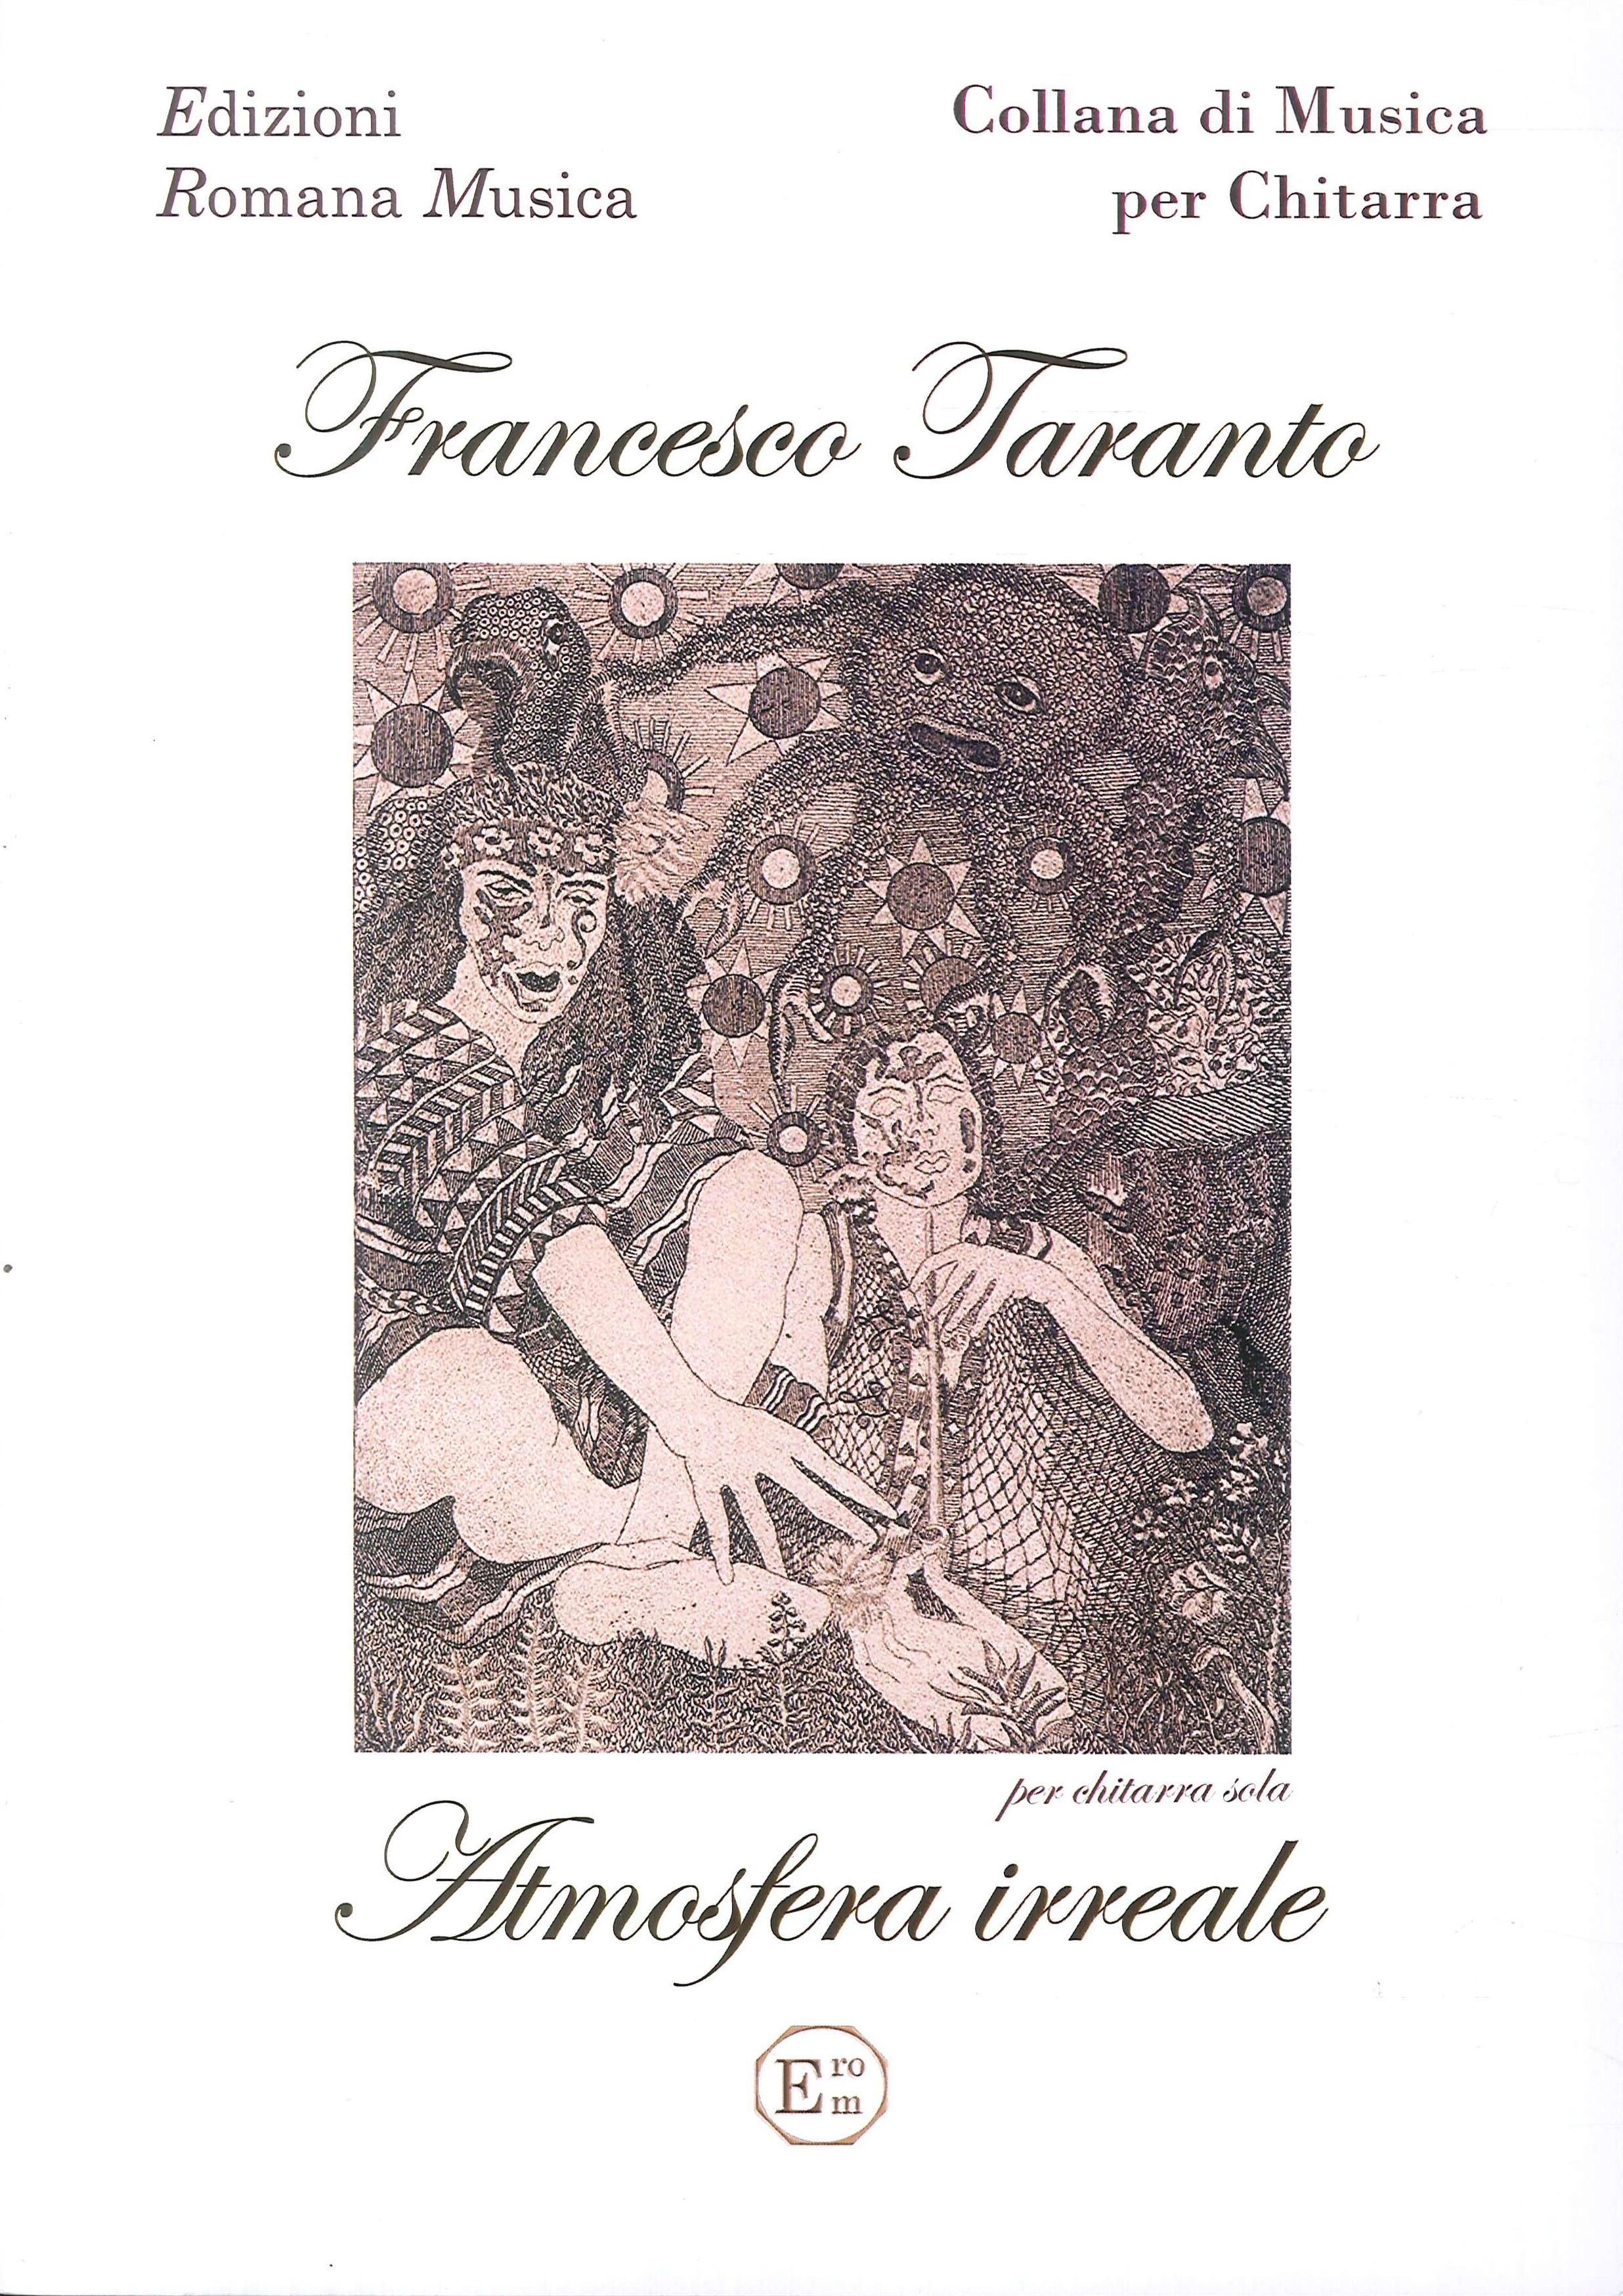 Francesco Taranto. Atmosfera Irreale. Musica per Chitarra. Erom 0058.